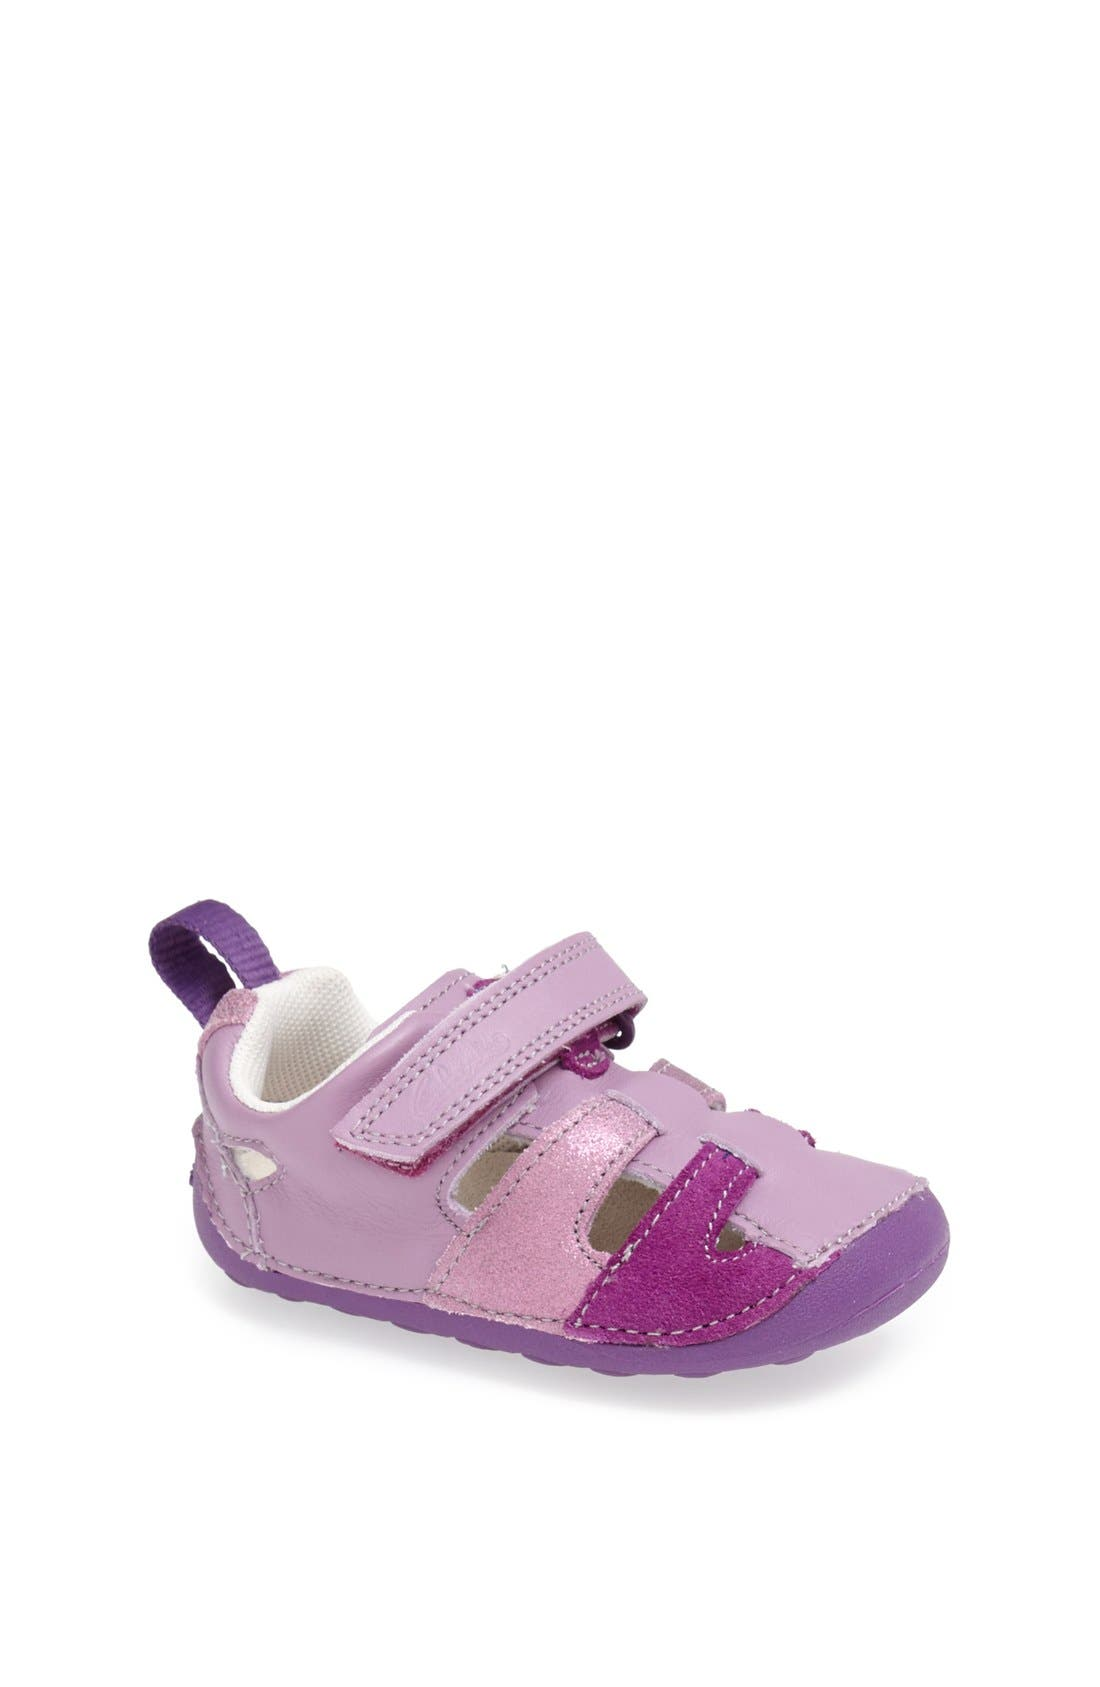 Main Image - Clarks® 'Tiny Girl' Leather Sandal (Baby & Walker)